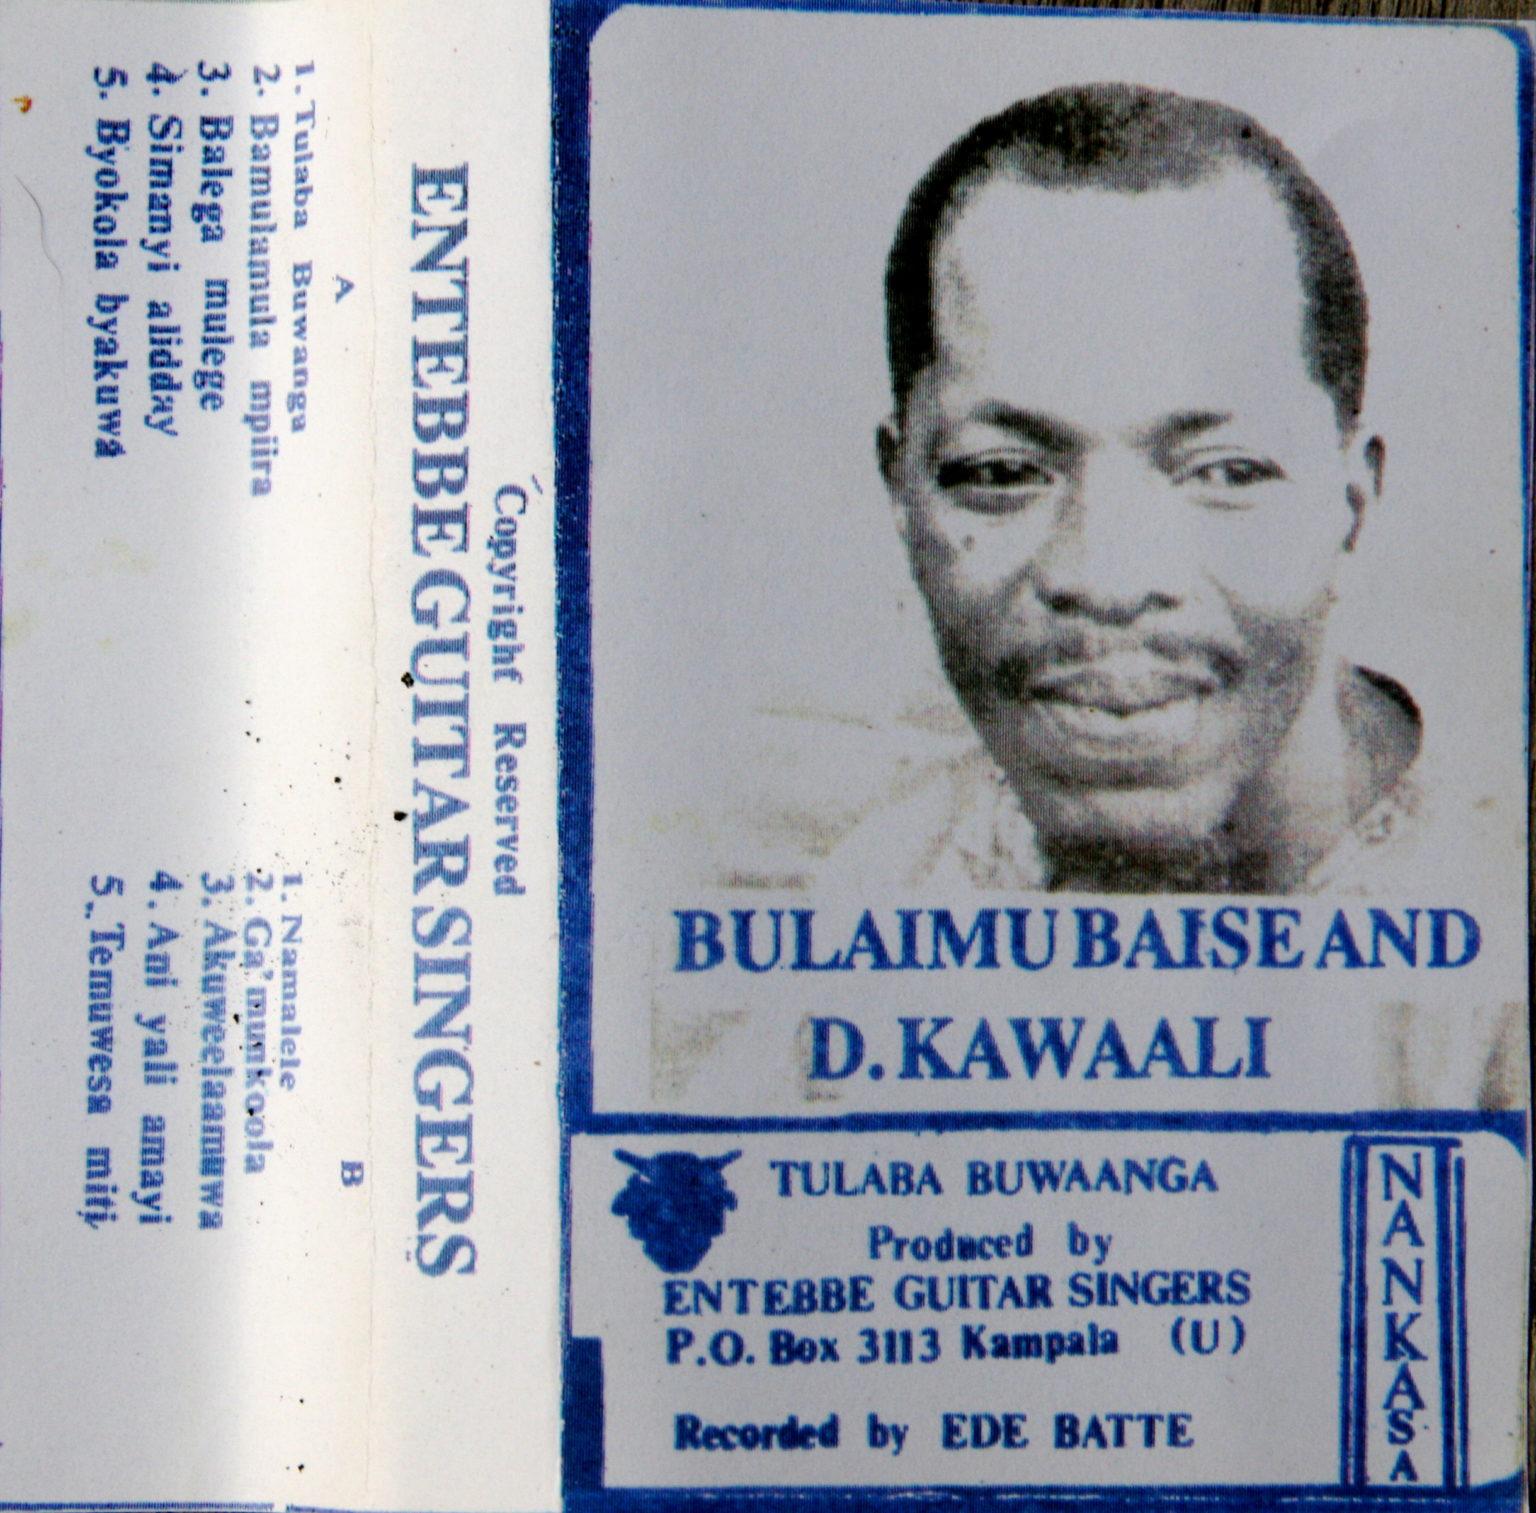 Bulaimu Blaise & D. Kawaali – Entebbe Guitar Singers UGANDA Folk Music ALBUM